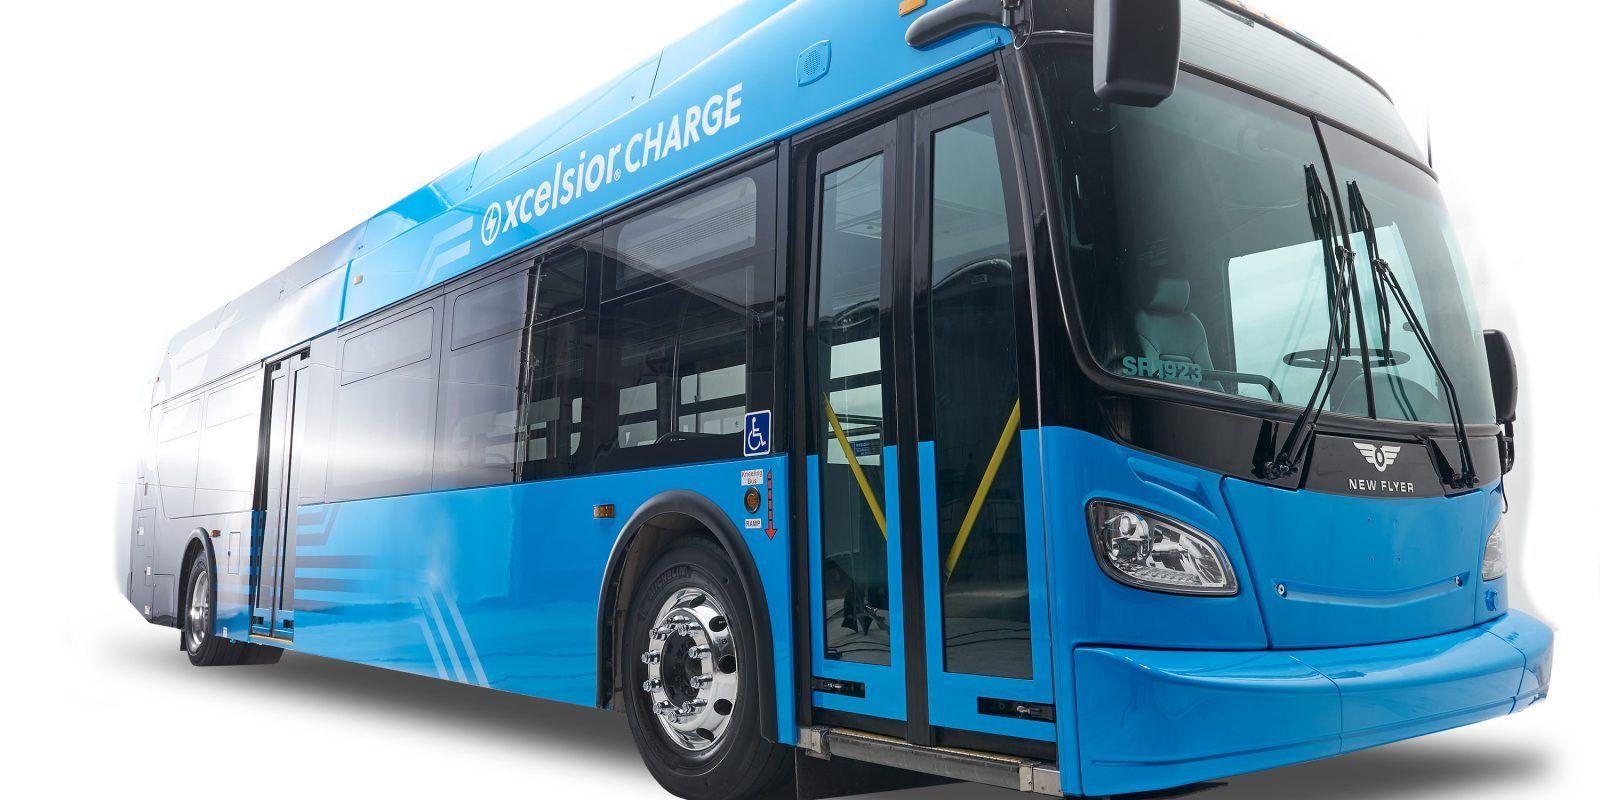 New Flyer Bus Wiring Diagram Pa 32 Wiring-diagram on tour bus, irizar bus, mercedes-benz bus, neoplan bus, temsa bus, nabi bus, new flyer bus, school bus, navistar bus, u.s. bus, volvo bus, bova bus, king long bus, setra bus, marcopolo bus, birthday party for bus, diana bus, eagle bus, ford bus, elbo bus,